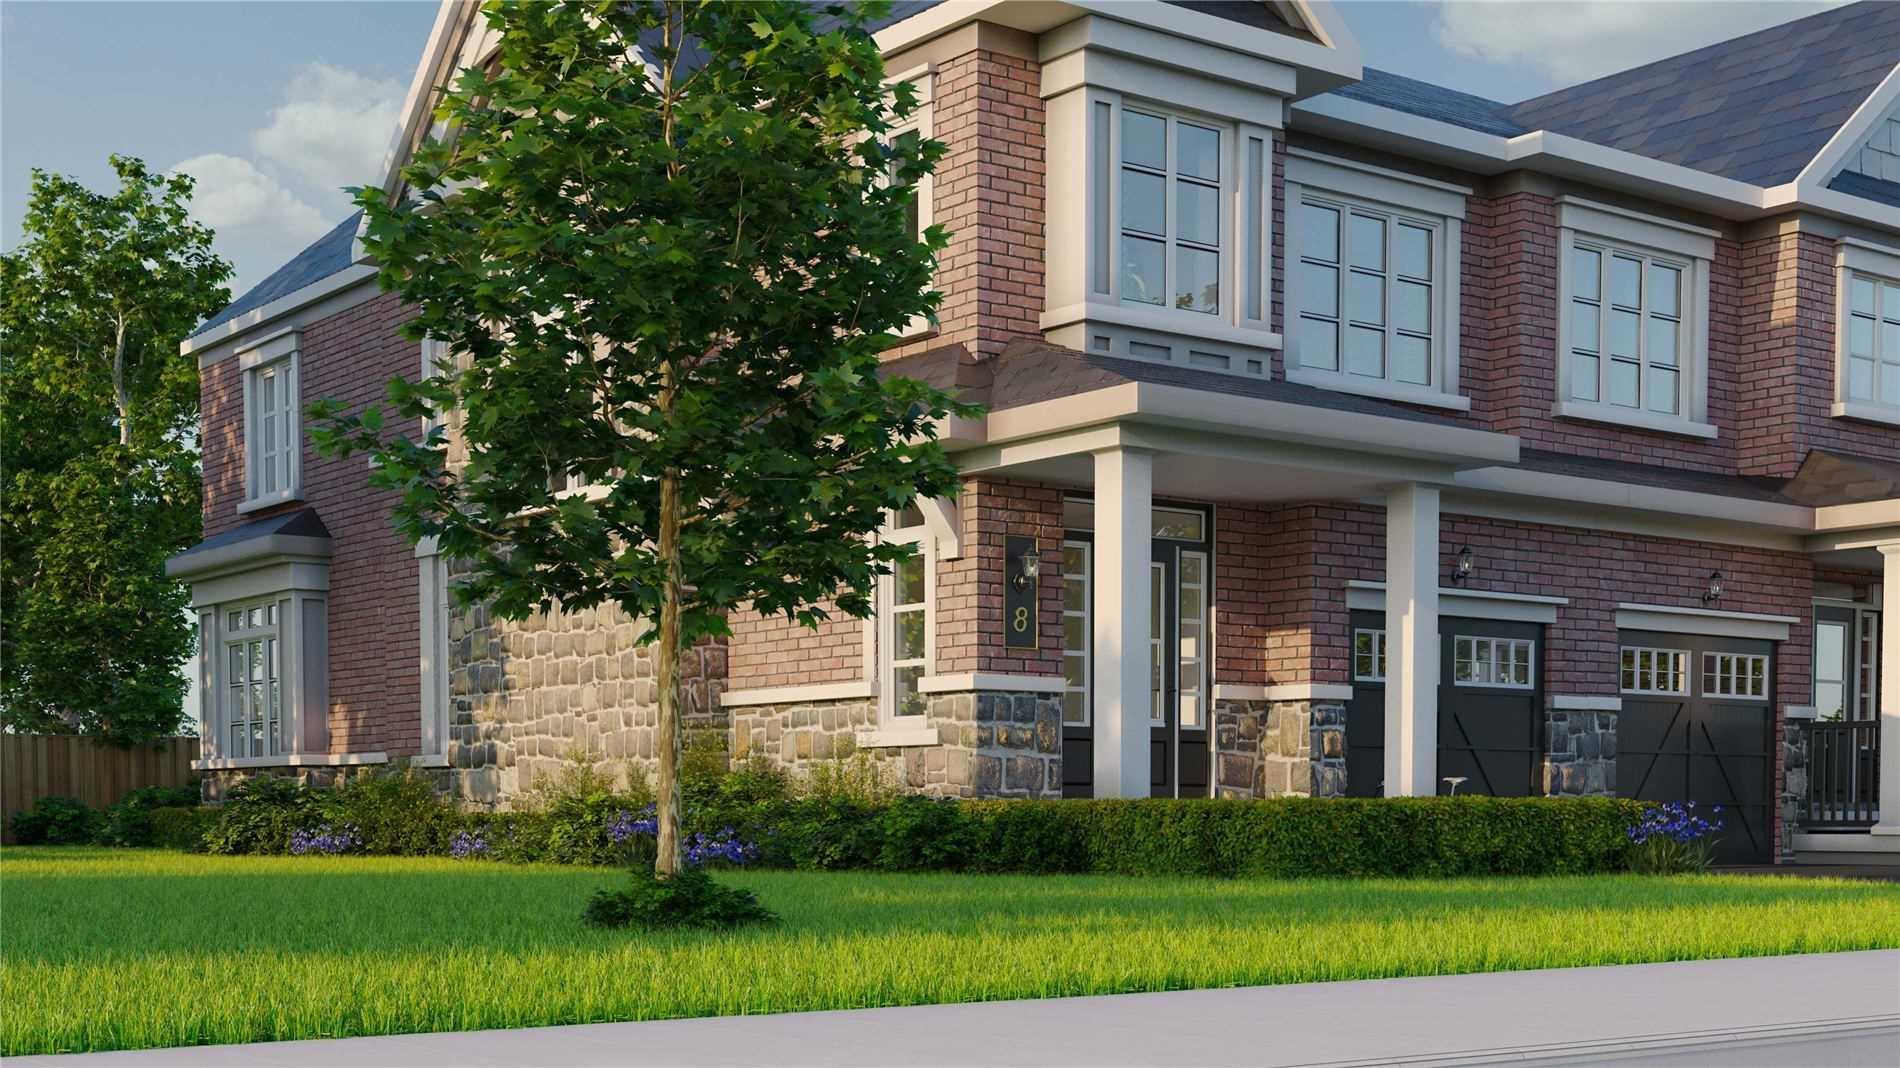 1636 Scugog St, Scugog, Ontario L9L1C8, 3 Bedrooms Bedrooms, ,3 BathroomsBathrooms,Att/row/twnhouse,For Sale,Scugog,E5165869